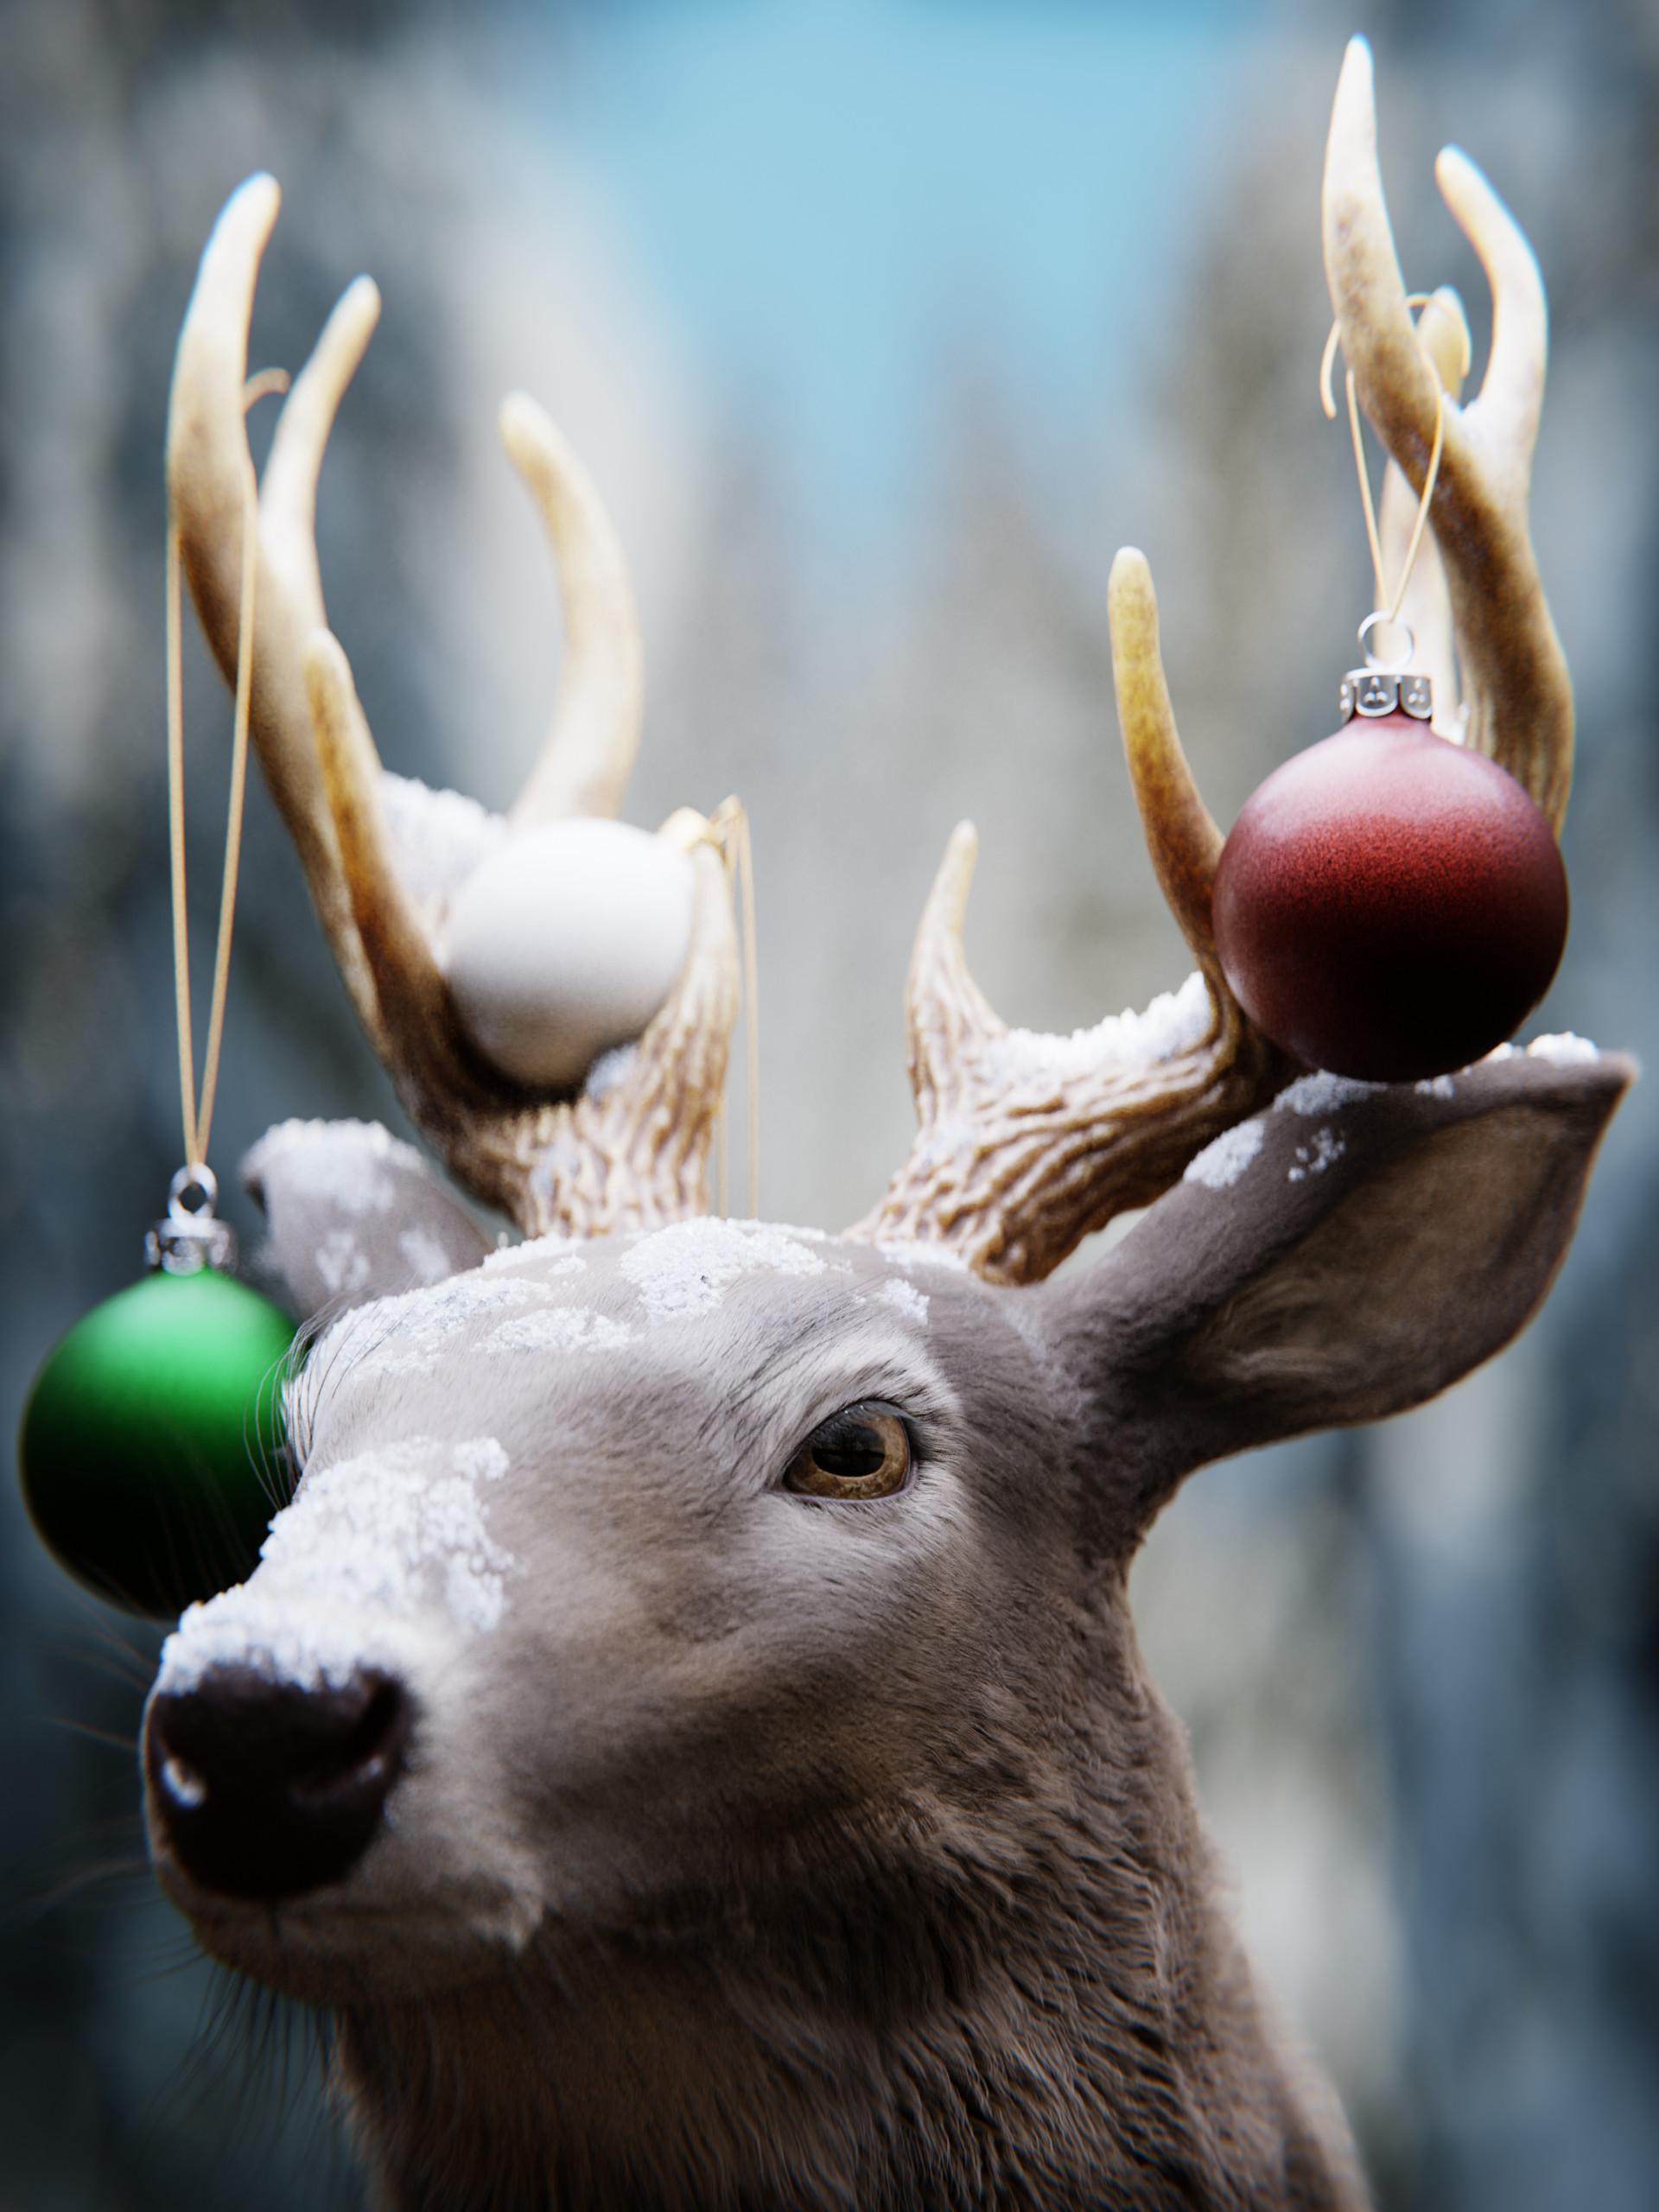 """Merry Christmas"" by Joe Lambert"